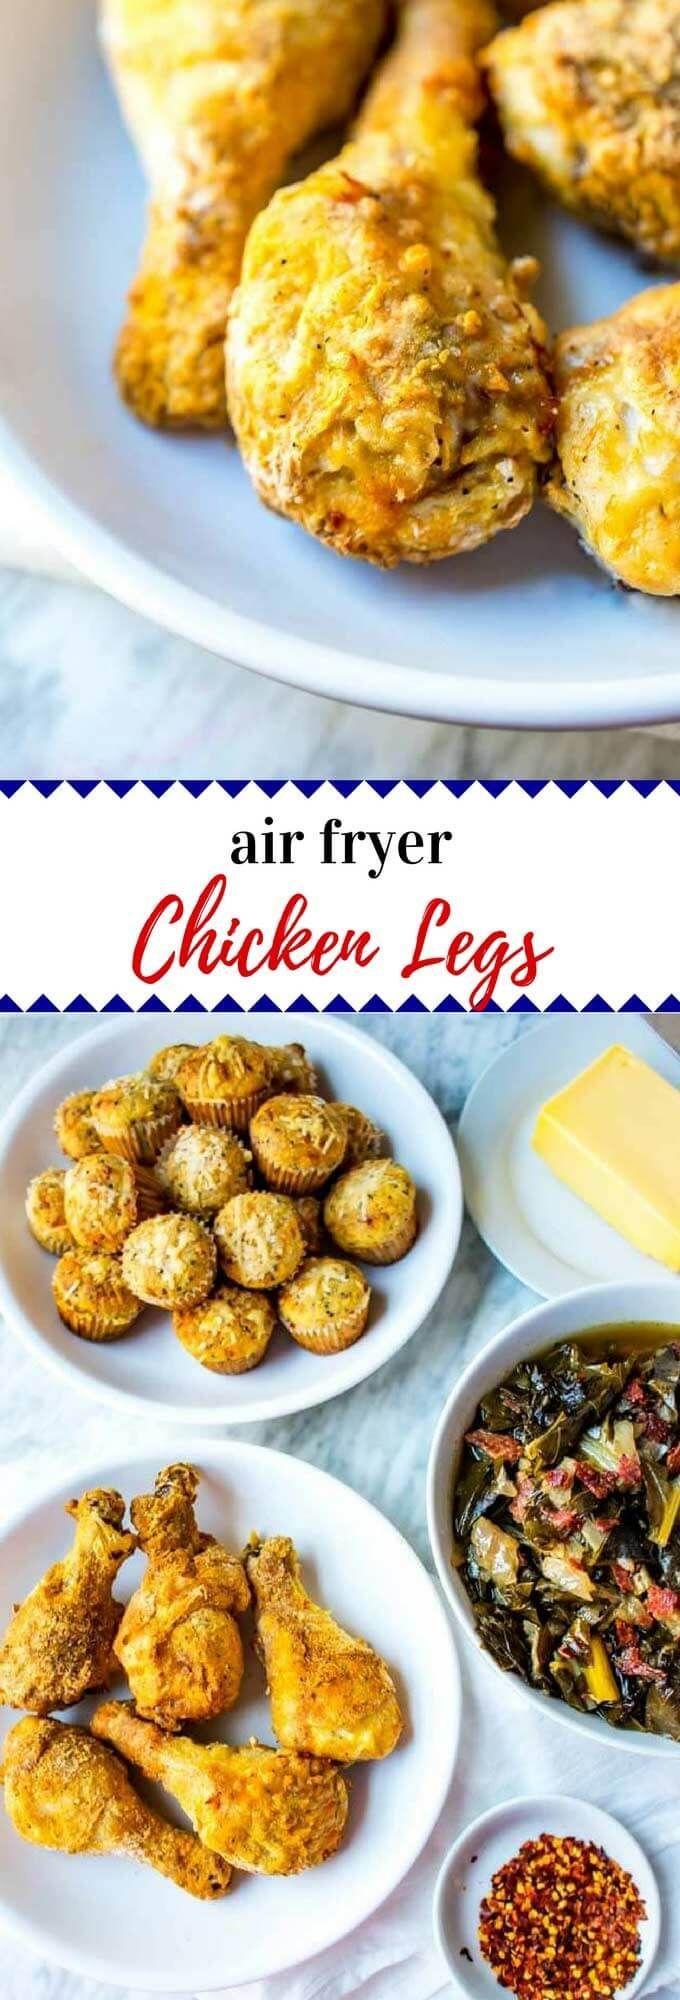 Air Fryer Fried Chicken Legs Recipe Fried chicken legs